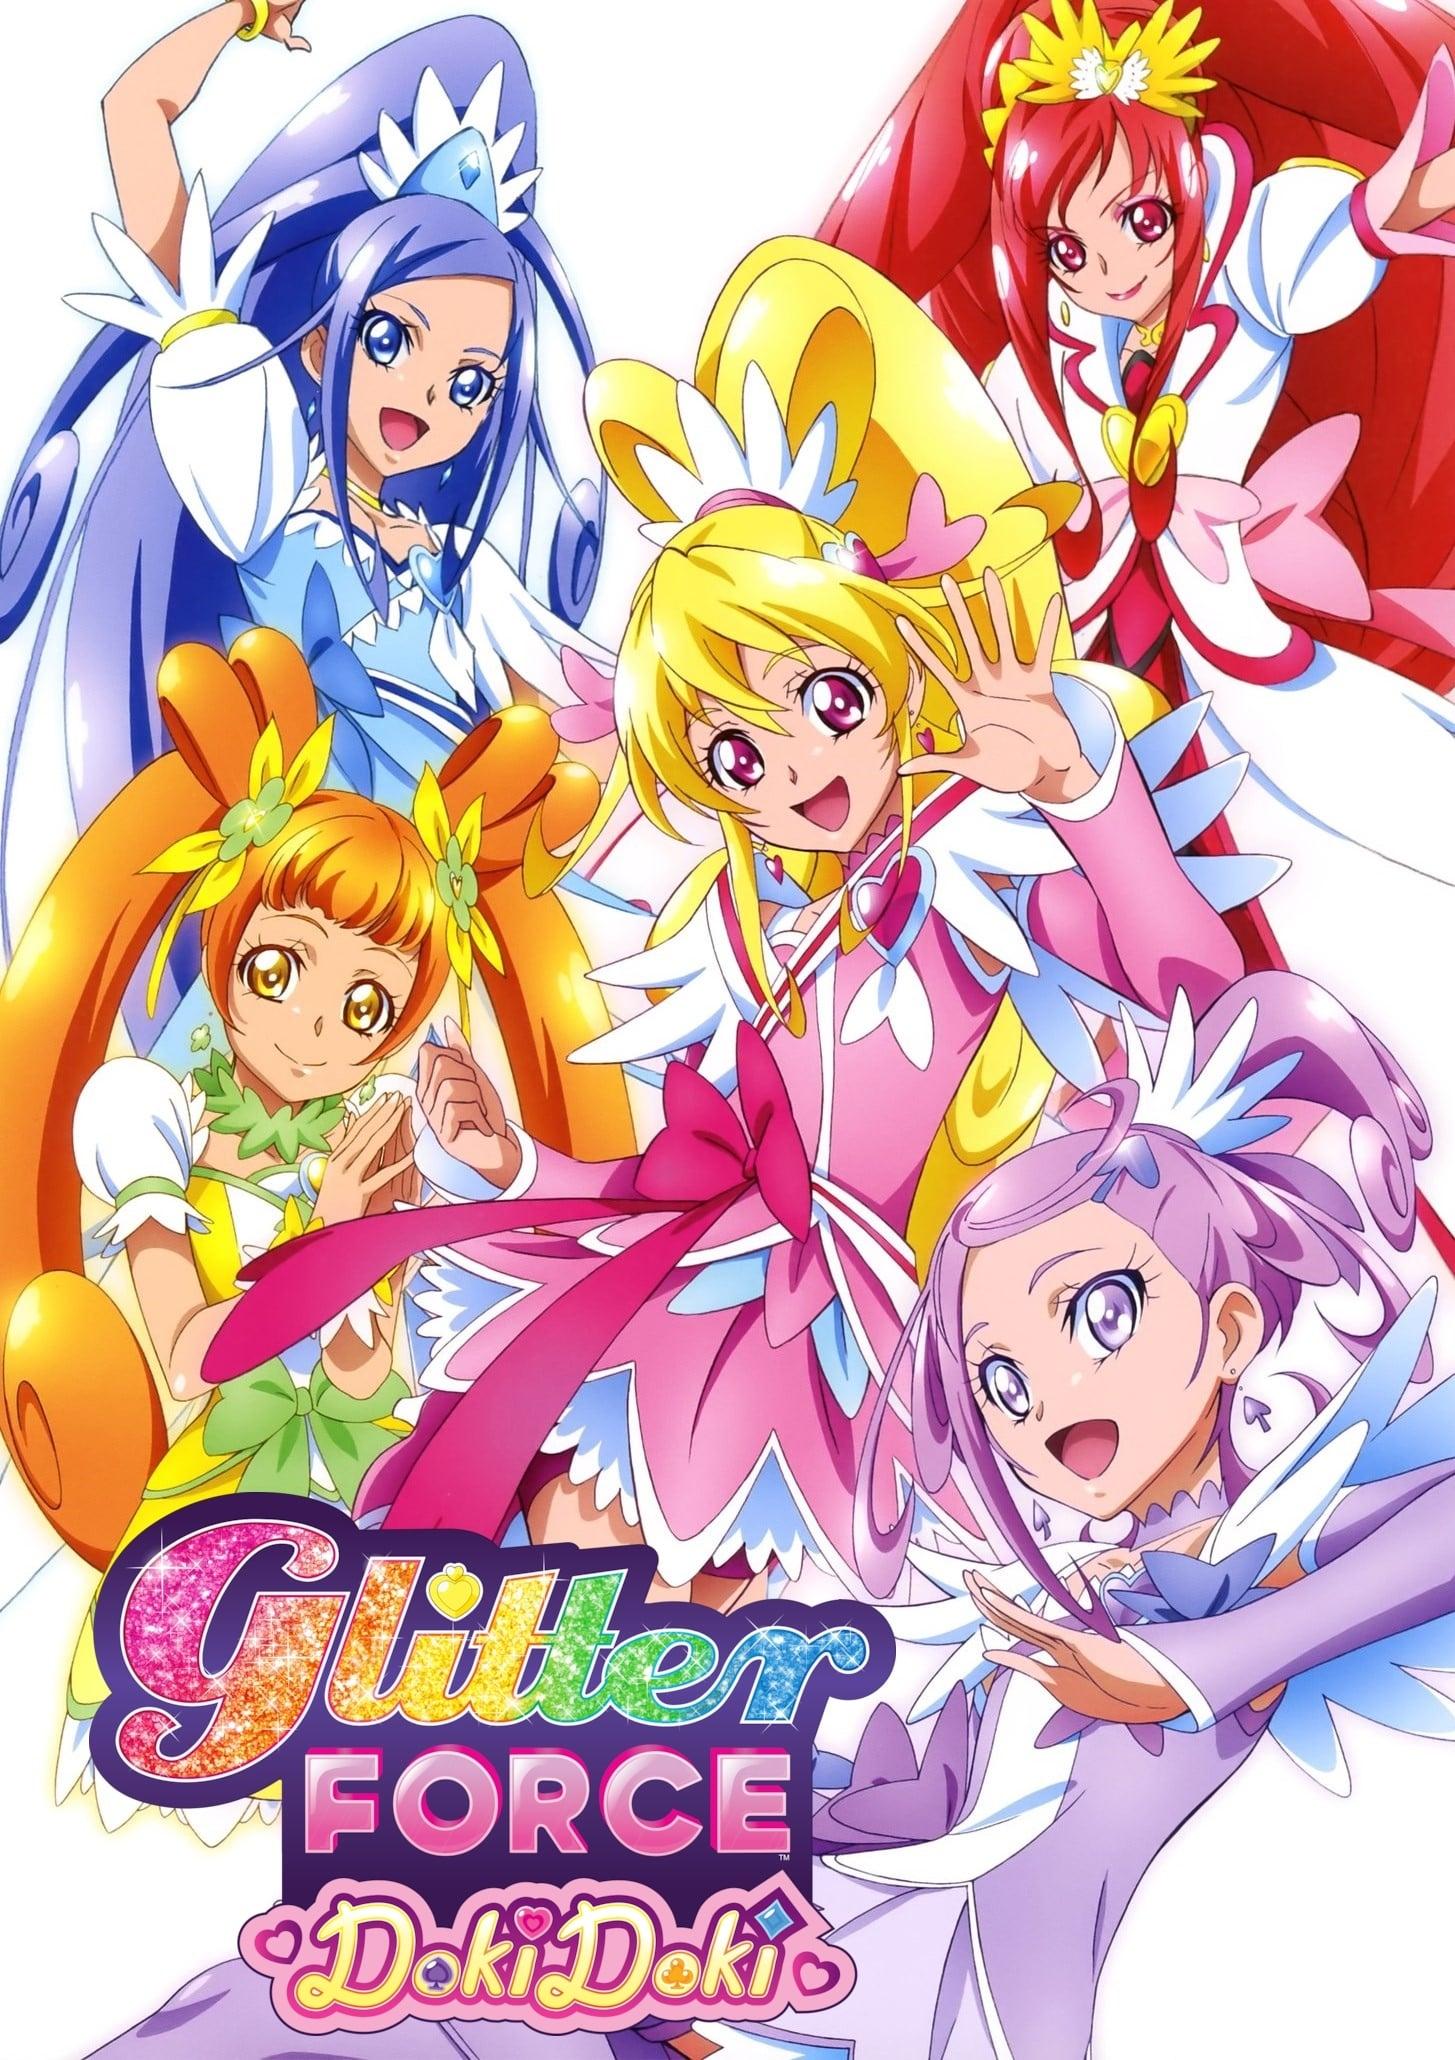 Glitter Force Doki Doki TV Shows About Female Protagonist